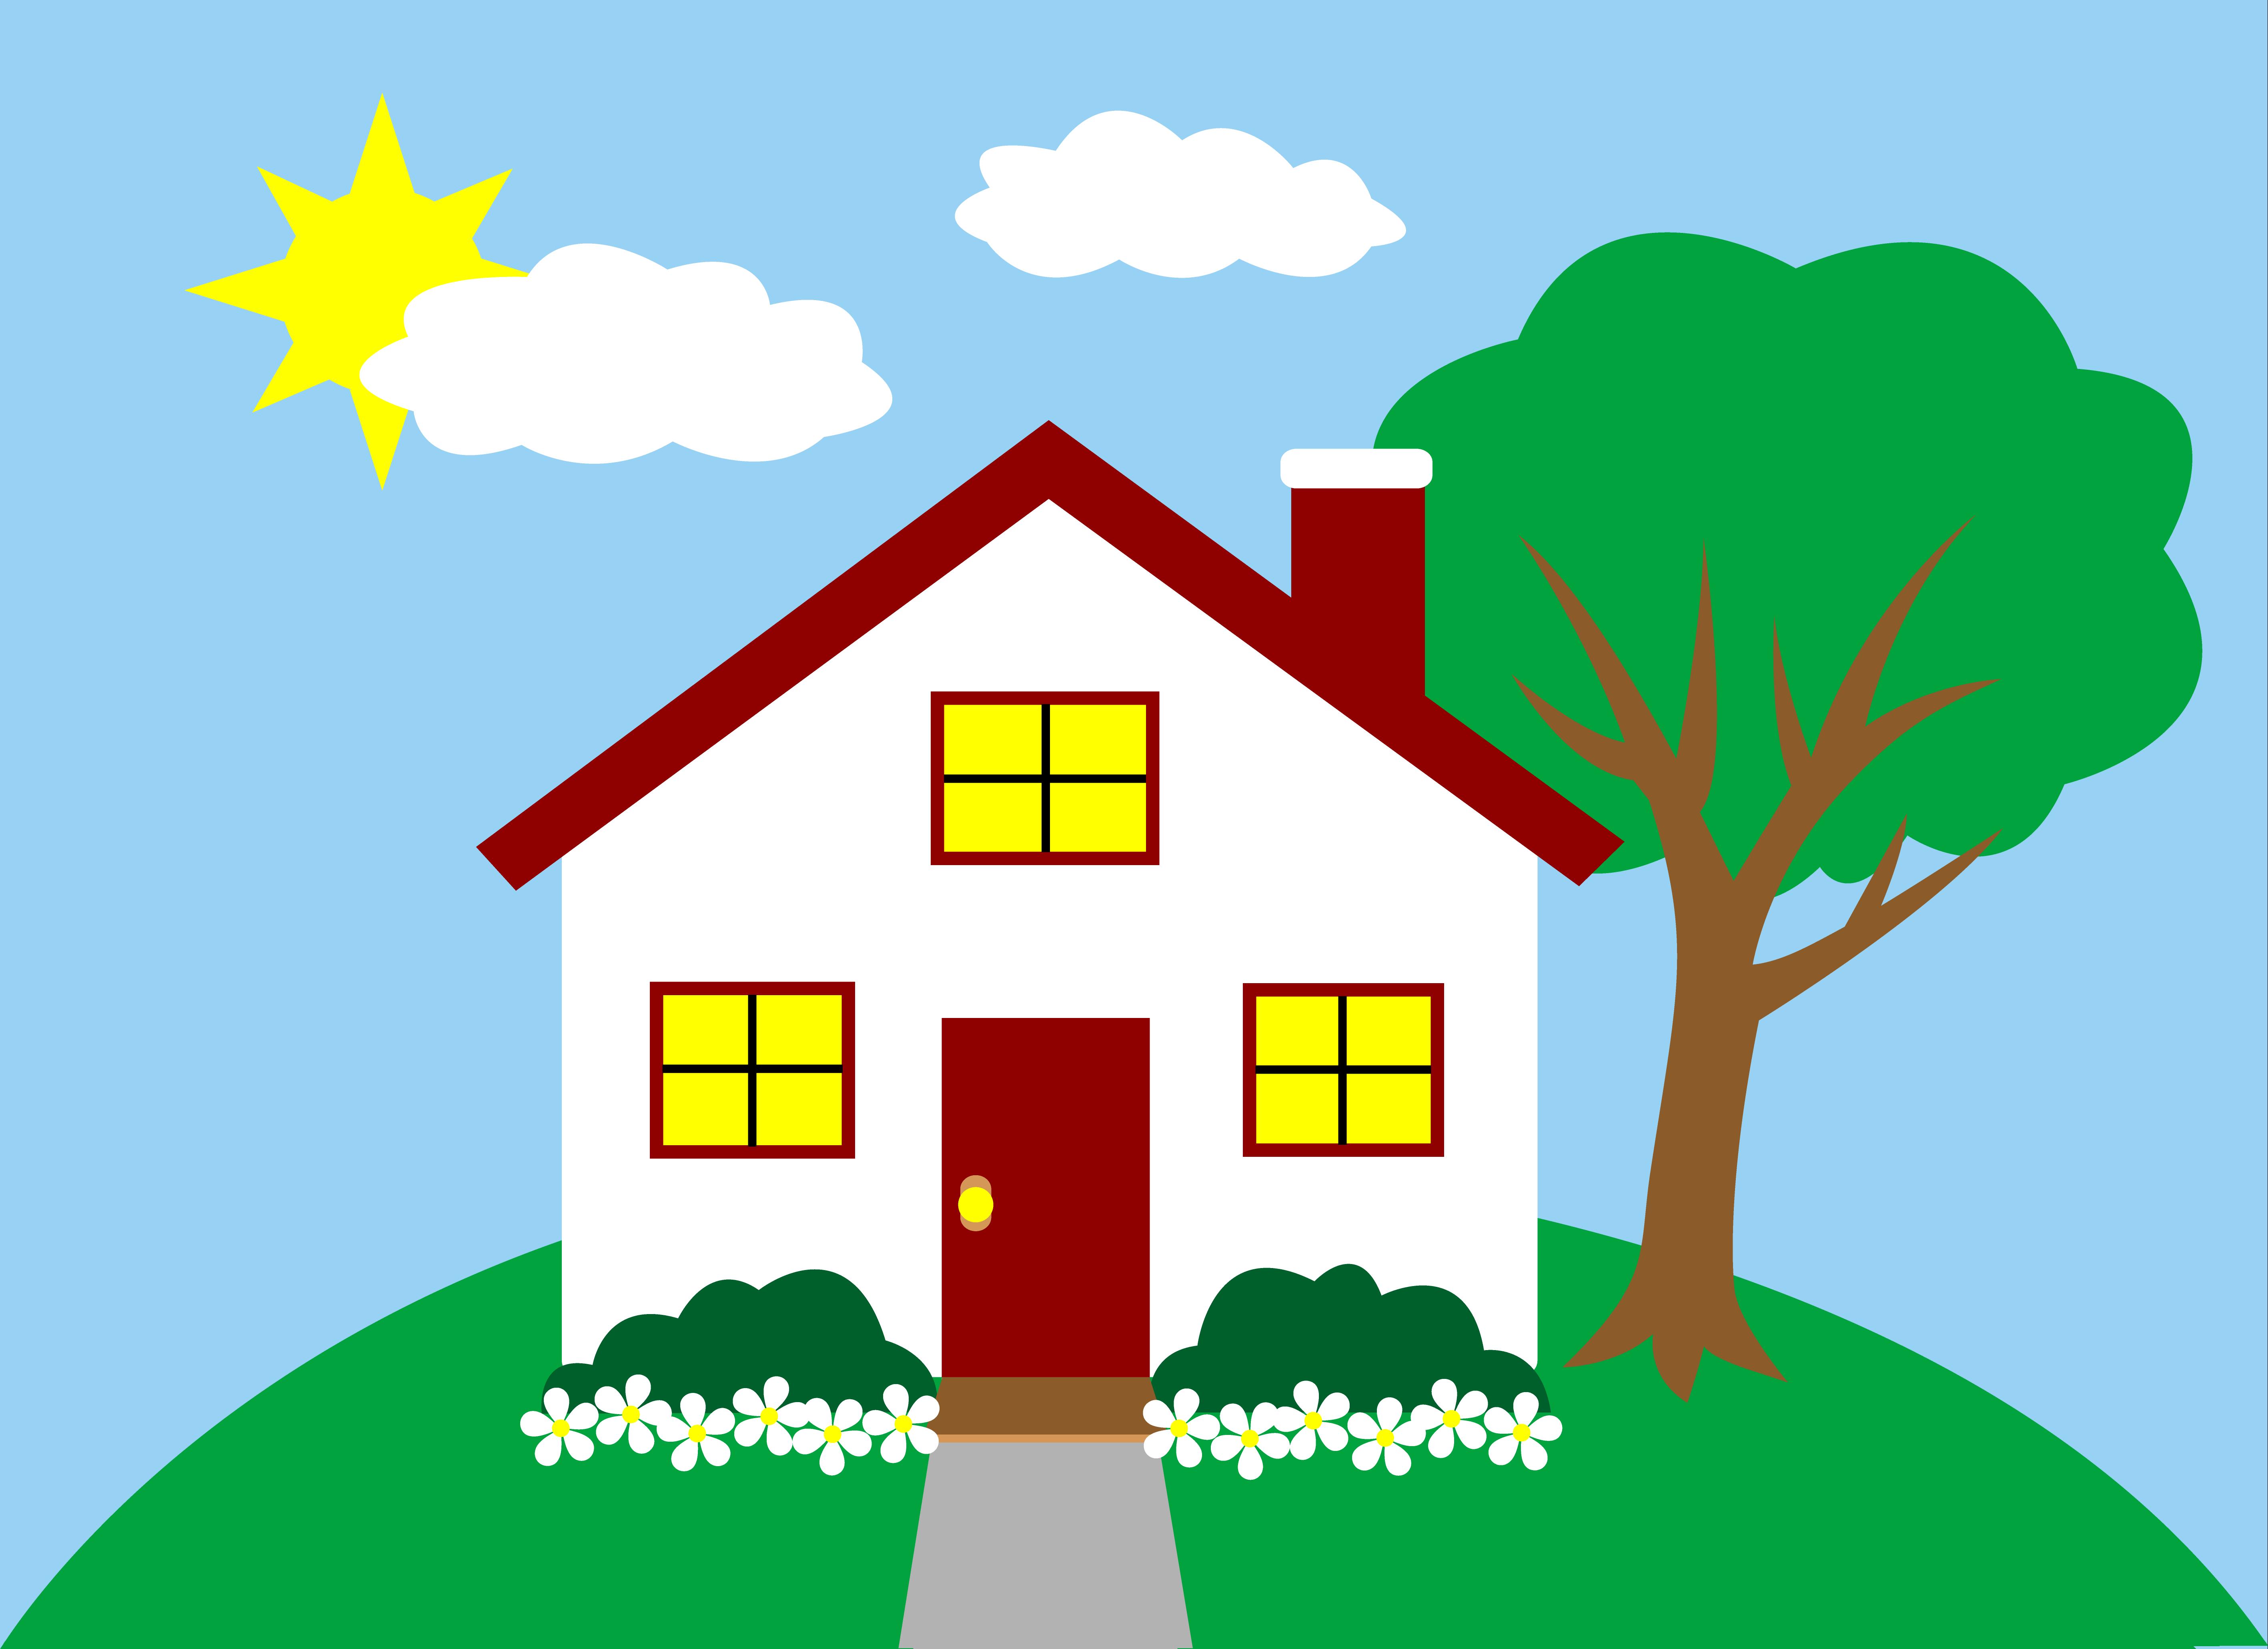 clipart house-clipart house-16